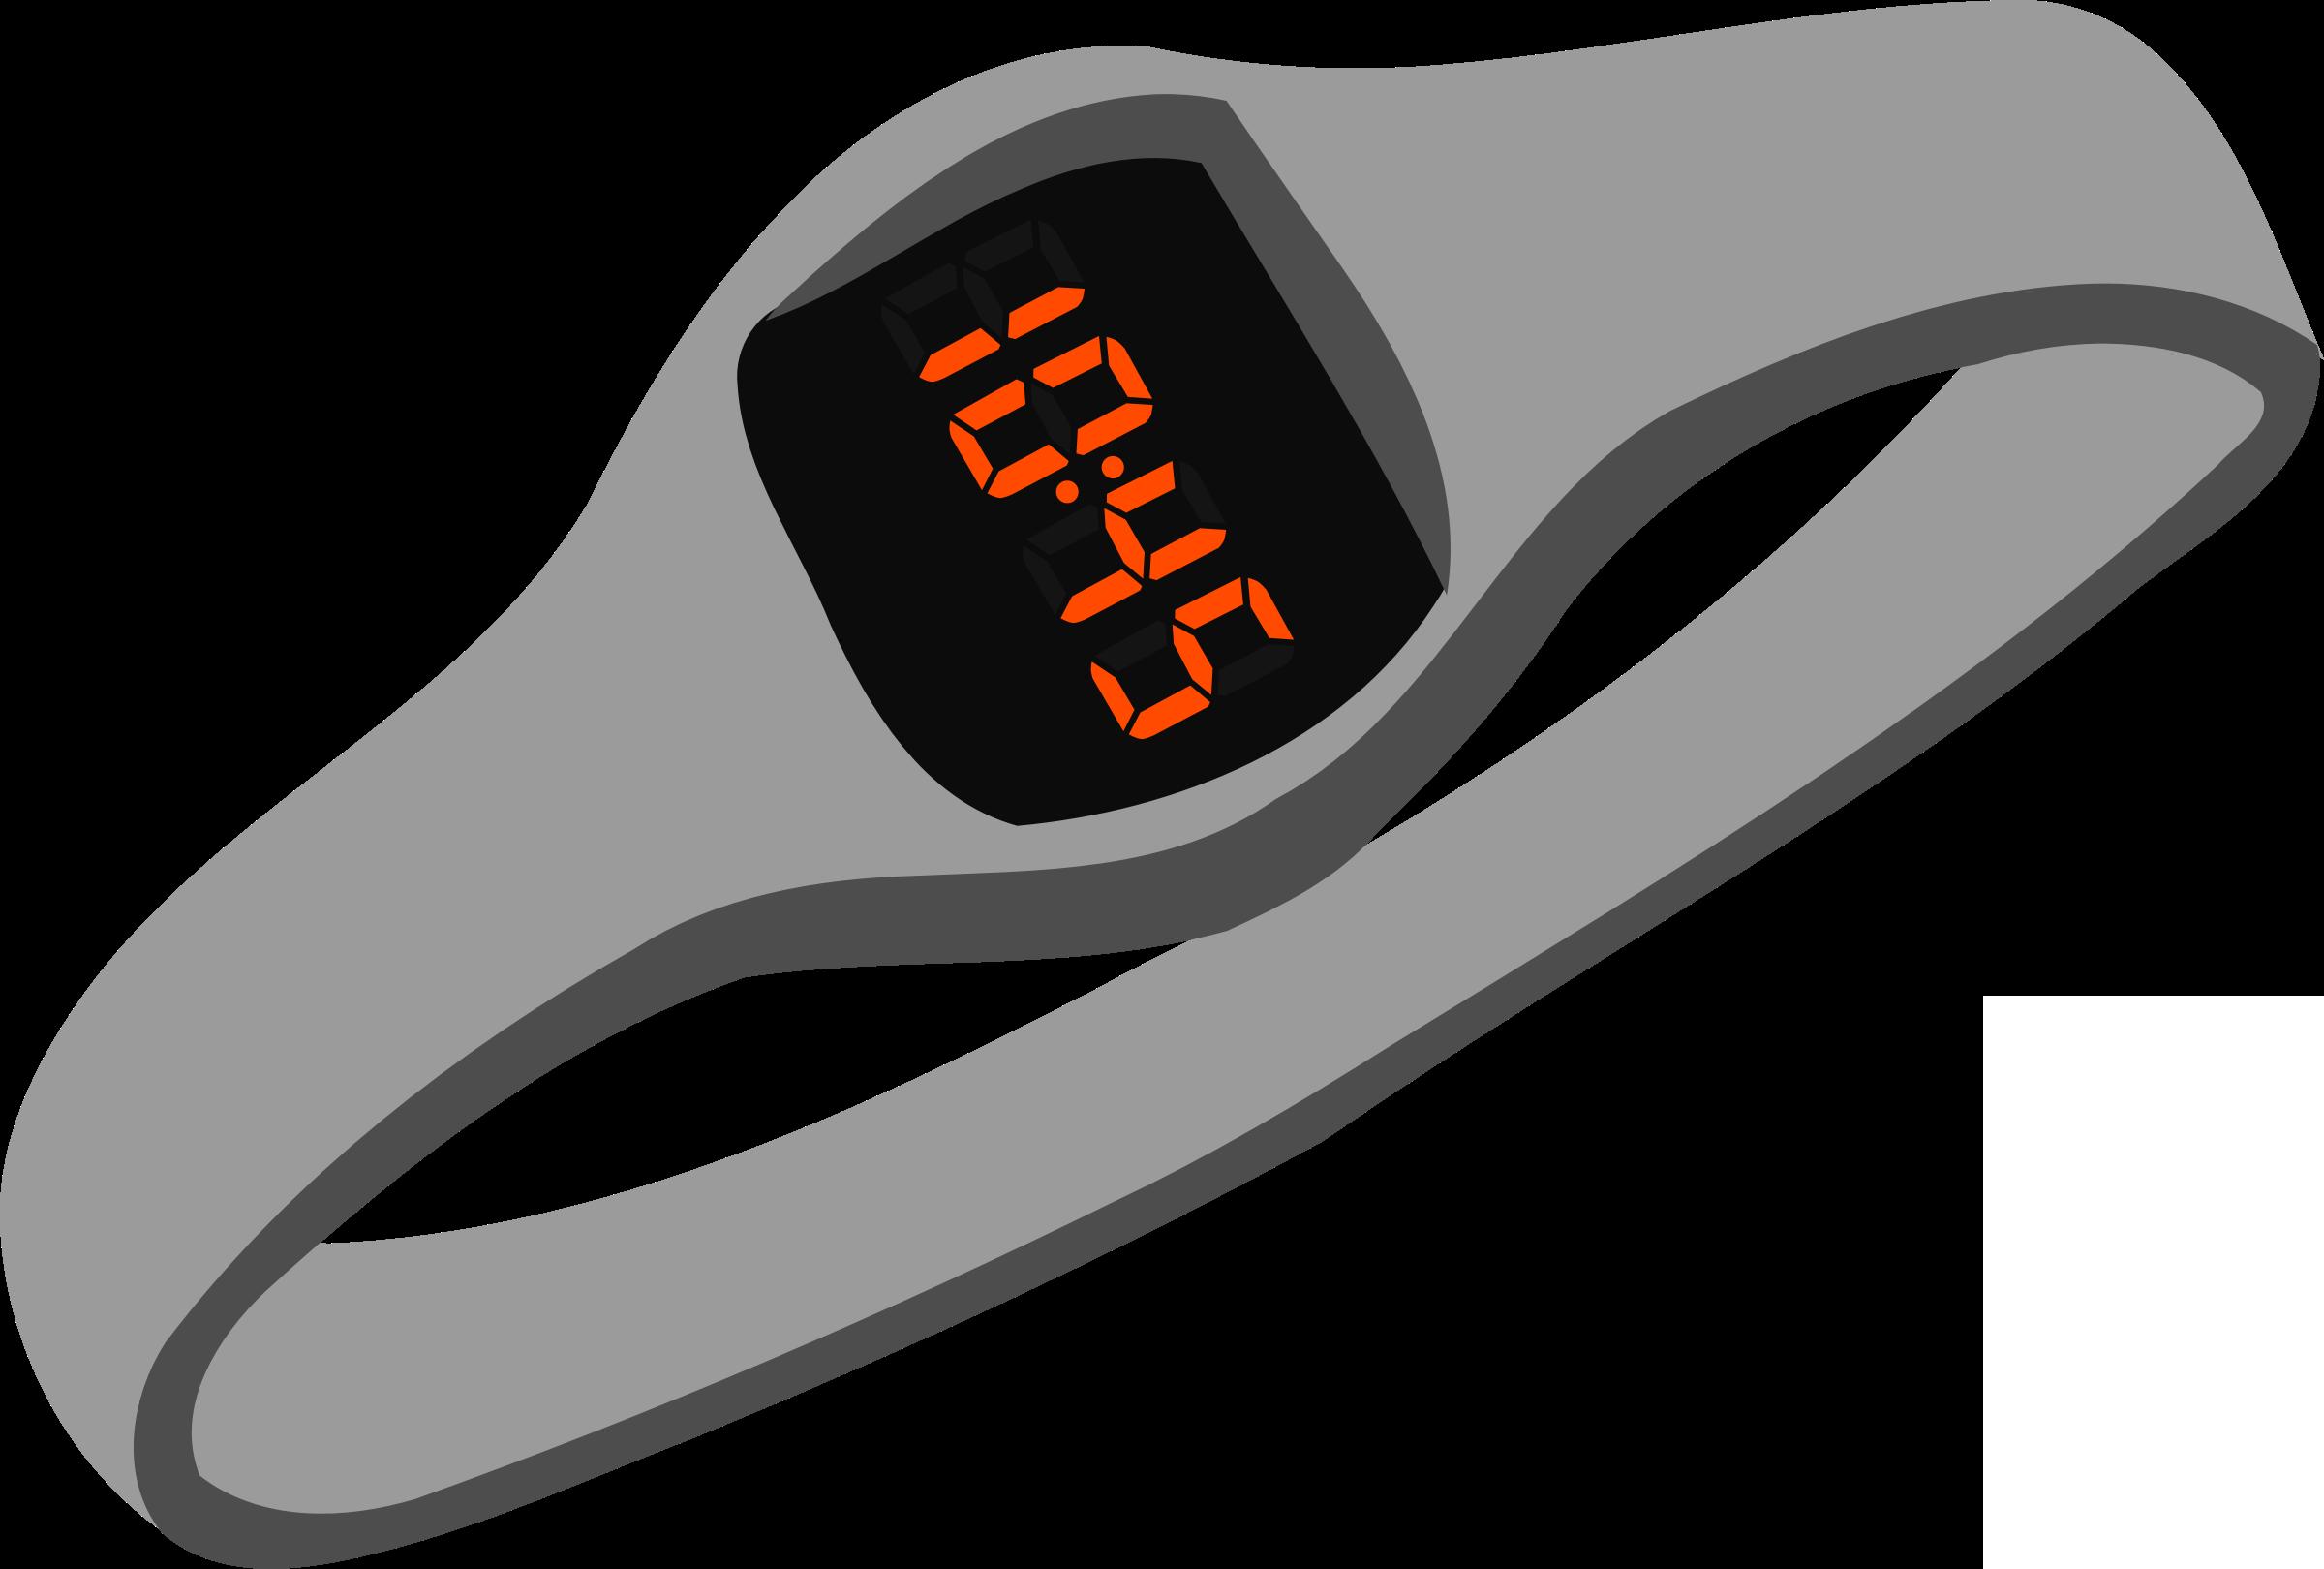 Digital Wristwatch Vector Clipart image.